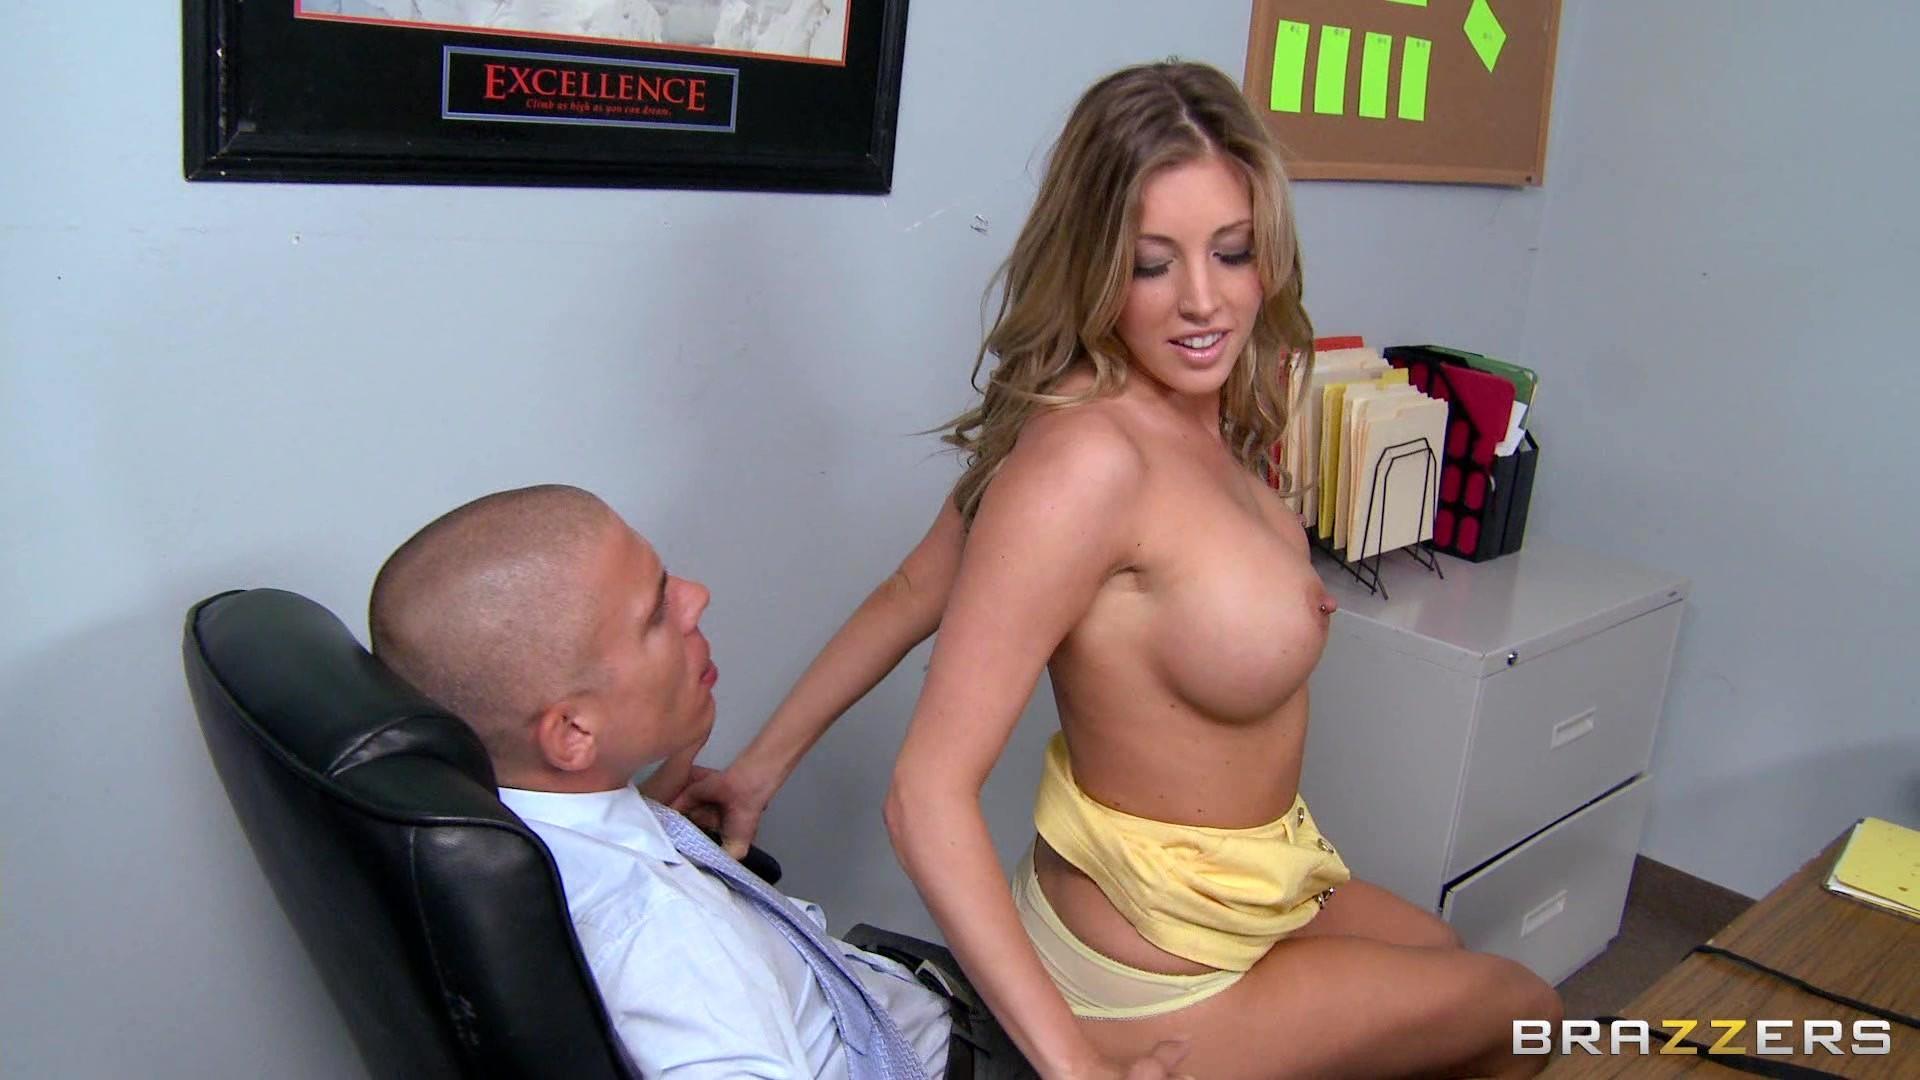 Big Tits At Work Vol 18 2013 Videos On Demand  Adult Dvd Empire-4945